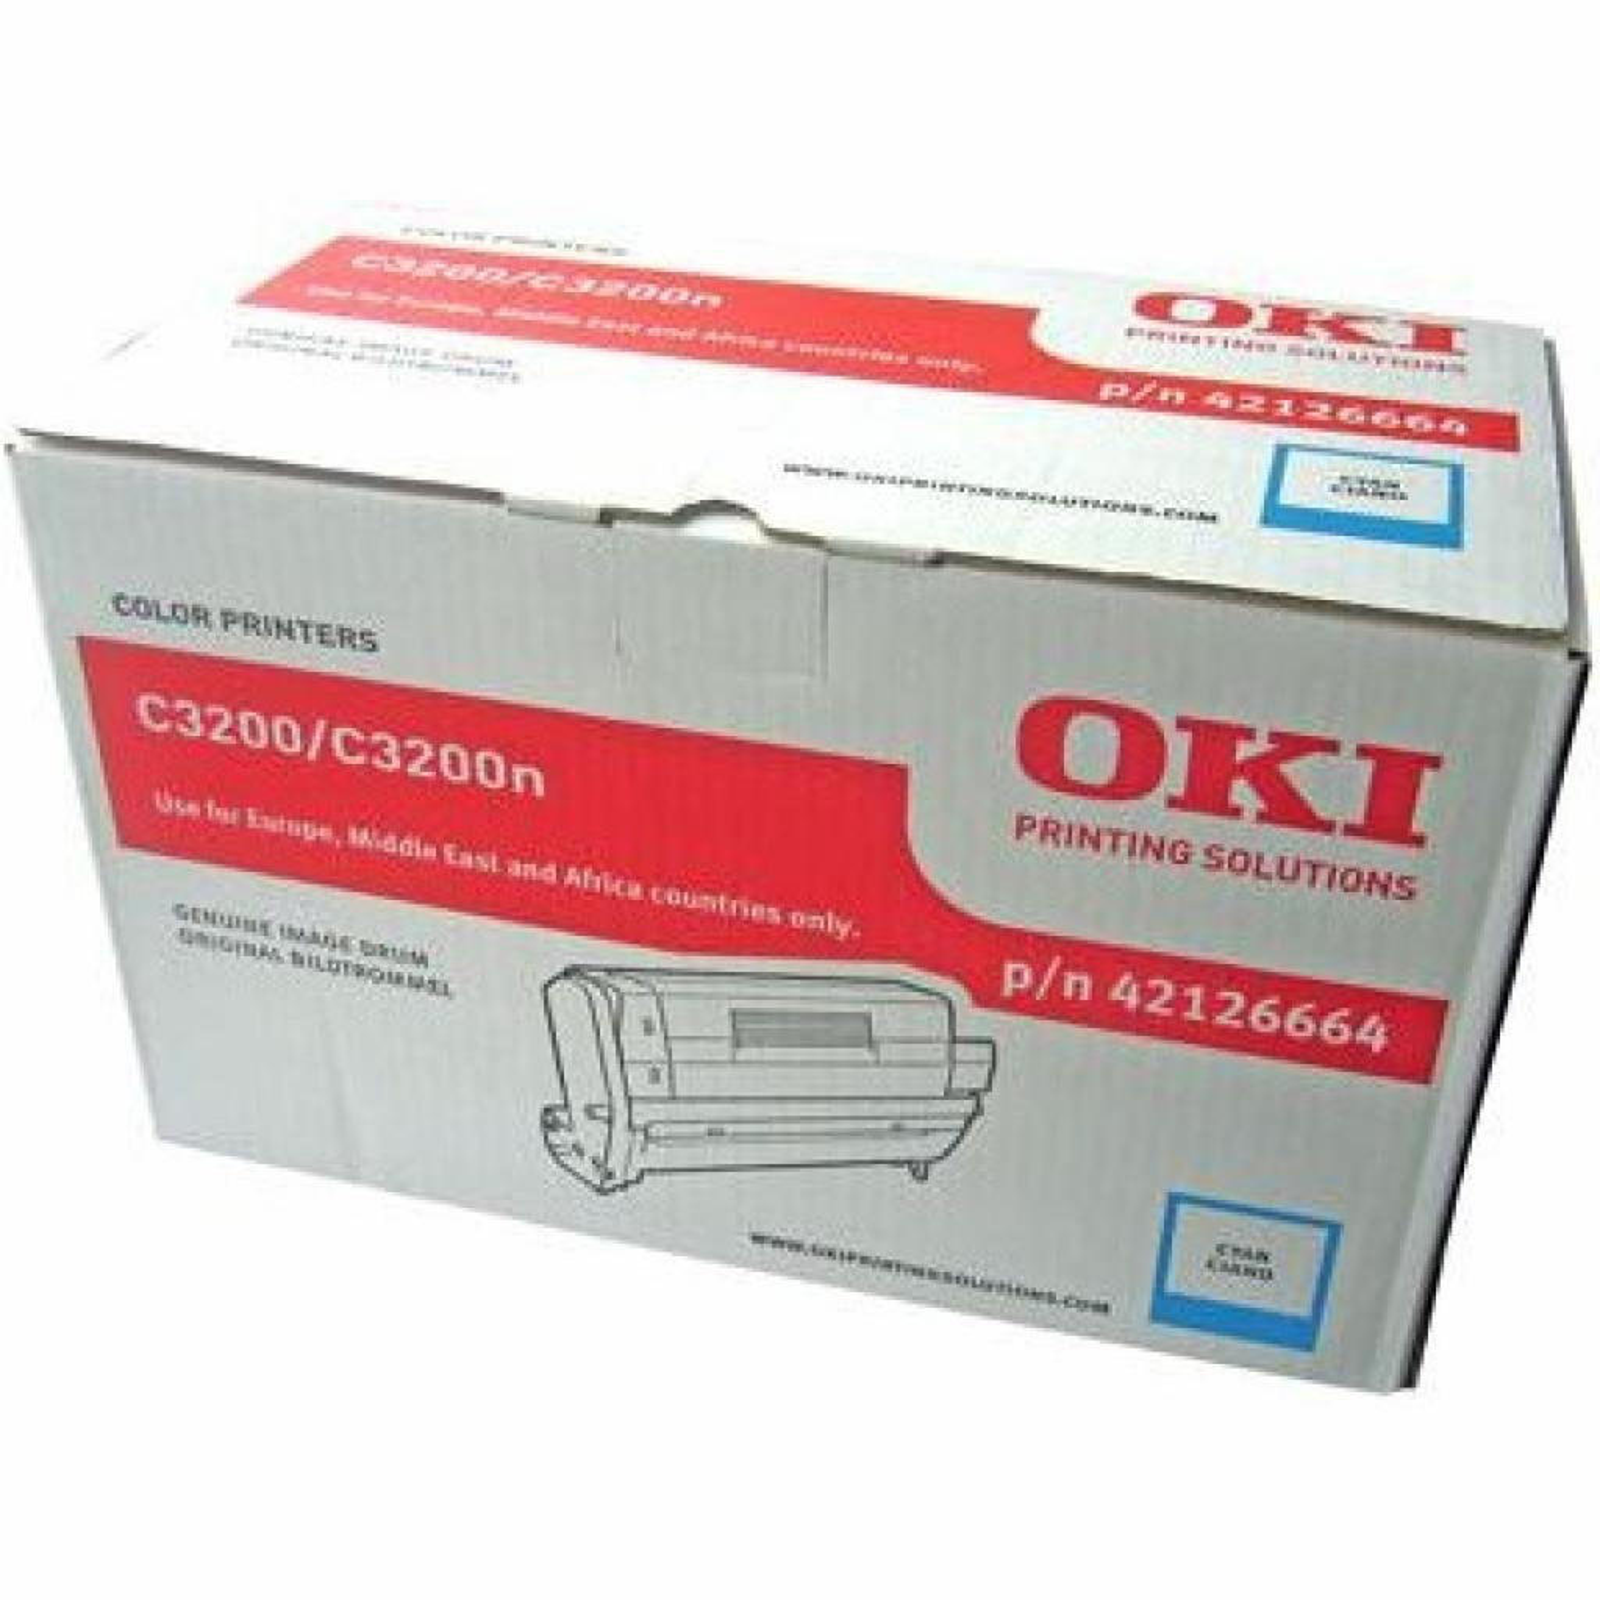 Фотокондуктор OKI C3200/3200N Cyan (42126664)